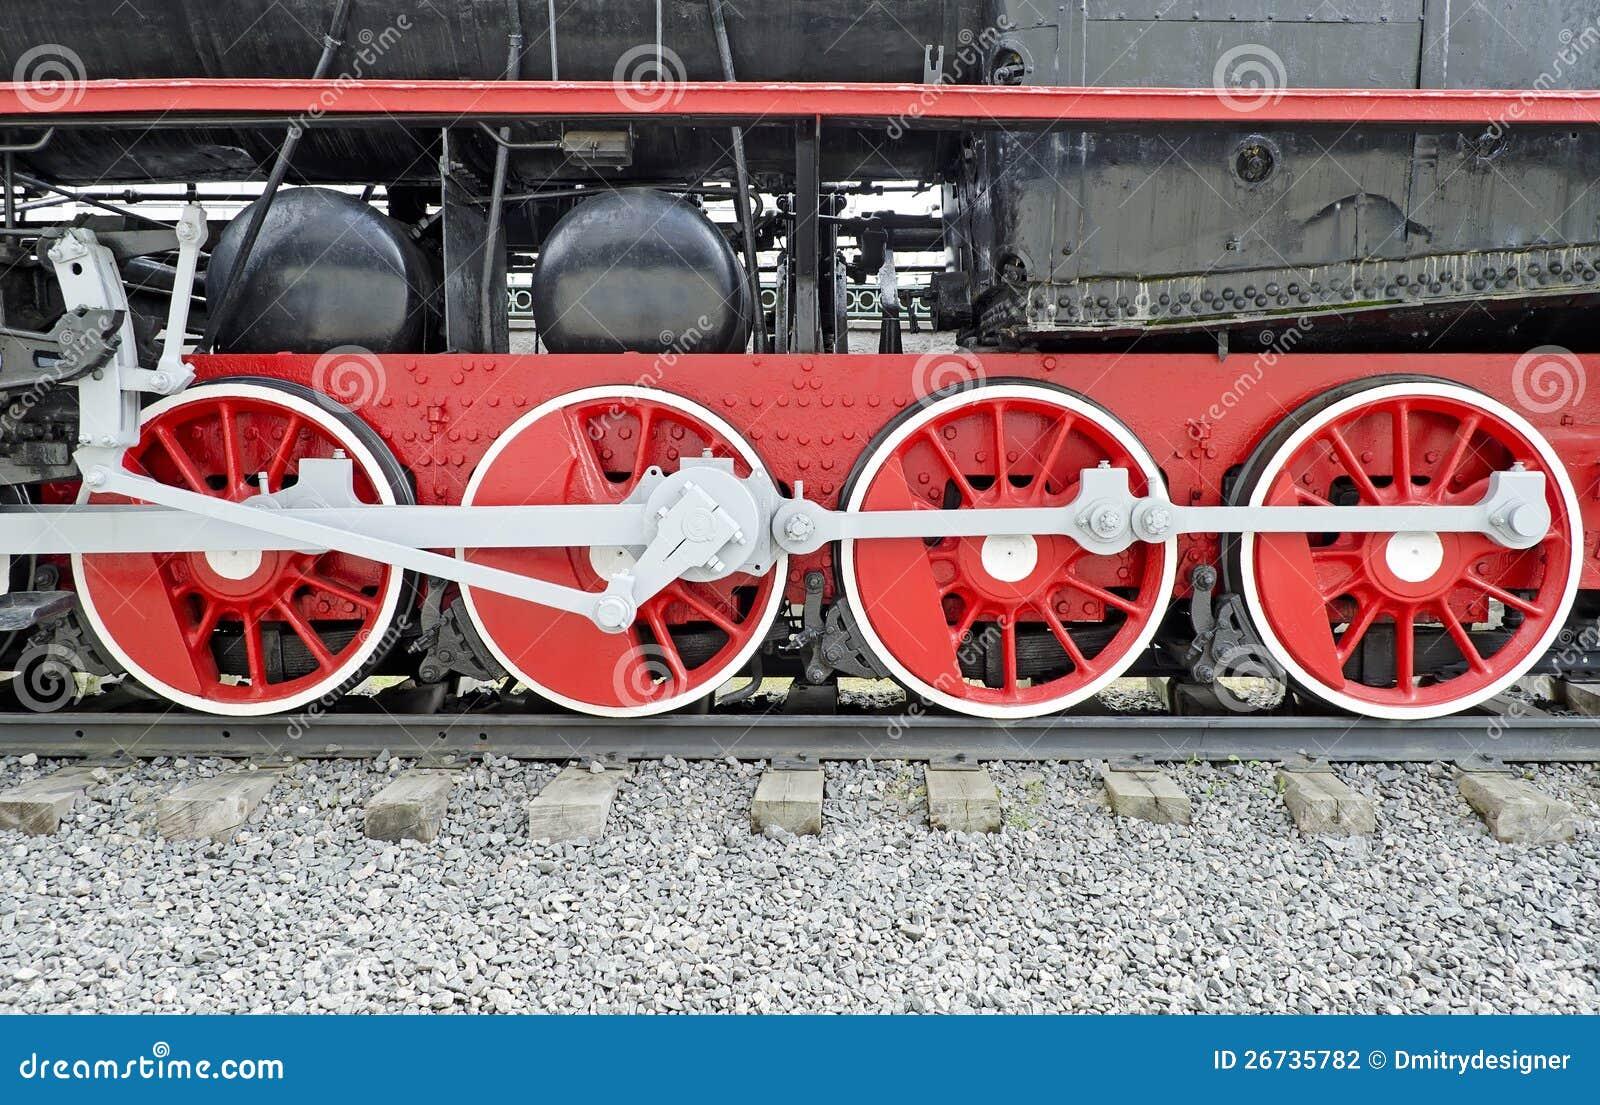 Steam Locomotive Wheels Stock Photography Image 26735782